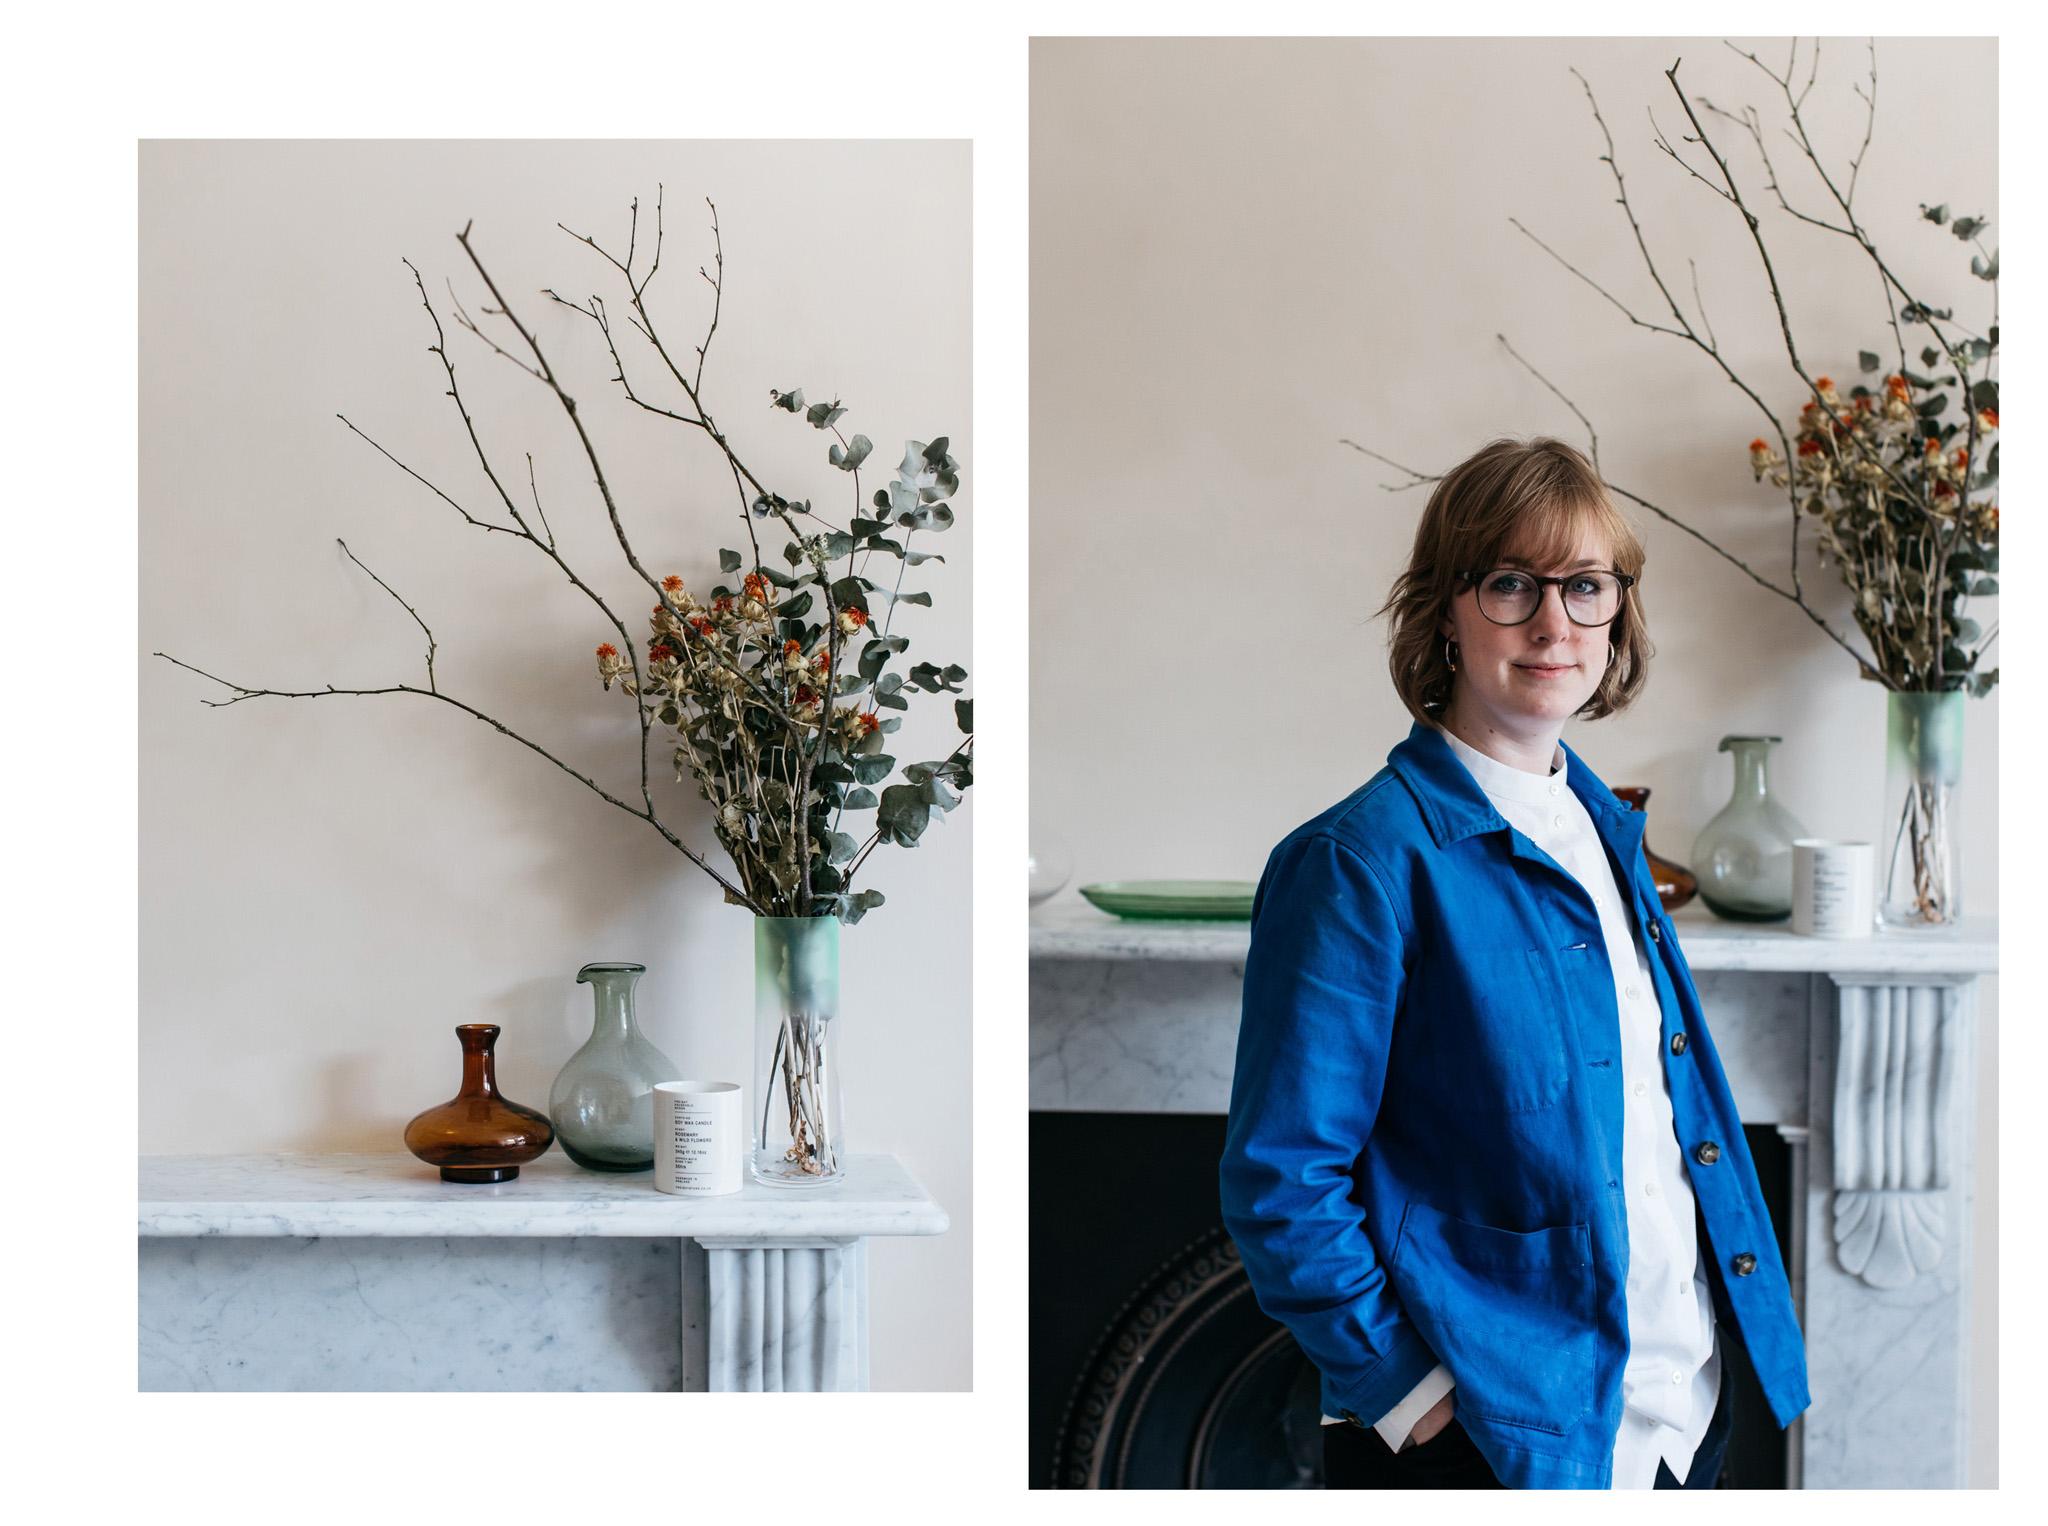 Natural light portrait photography by Brighton photographer Emma Croman